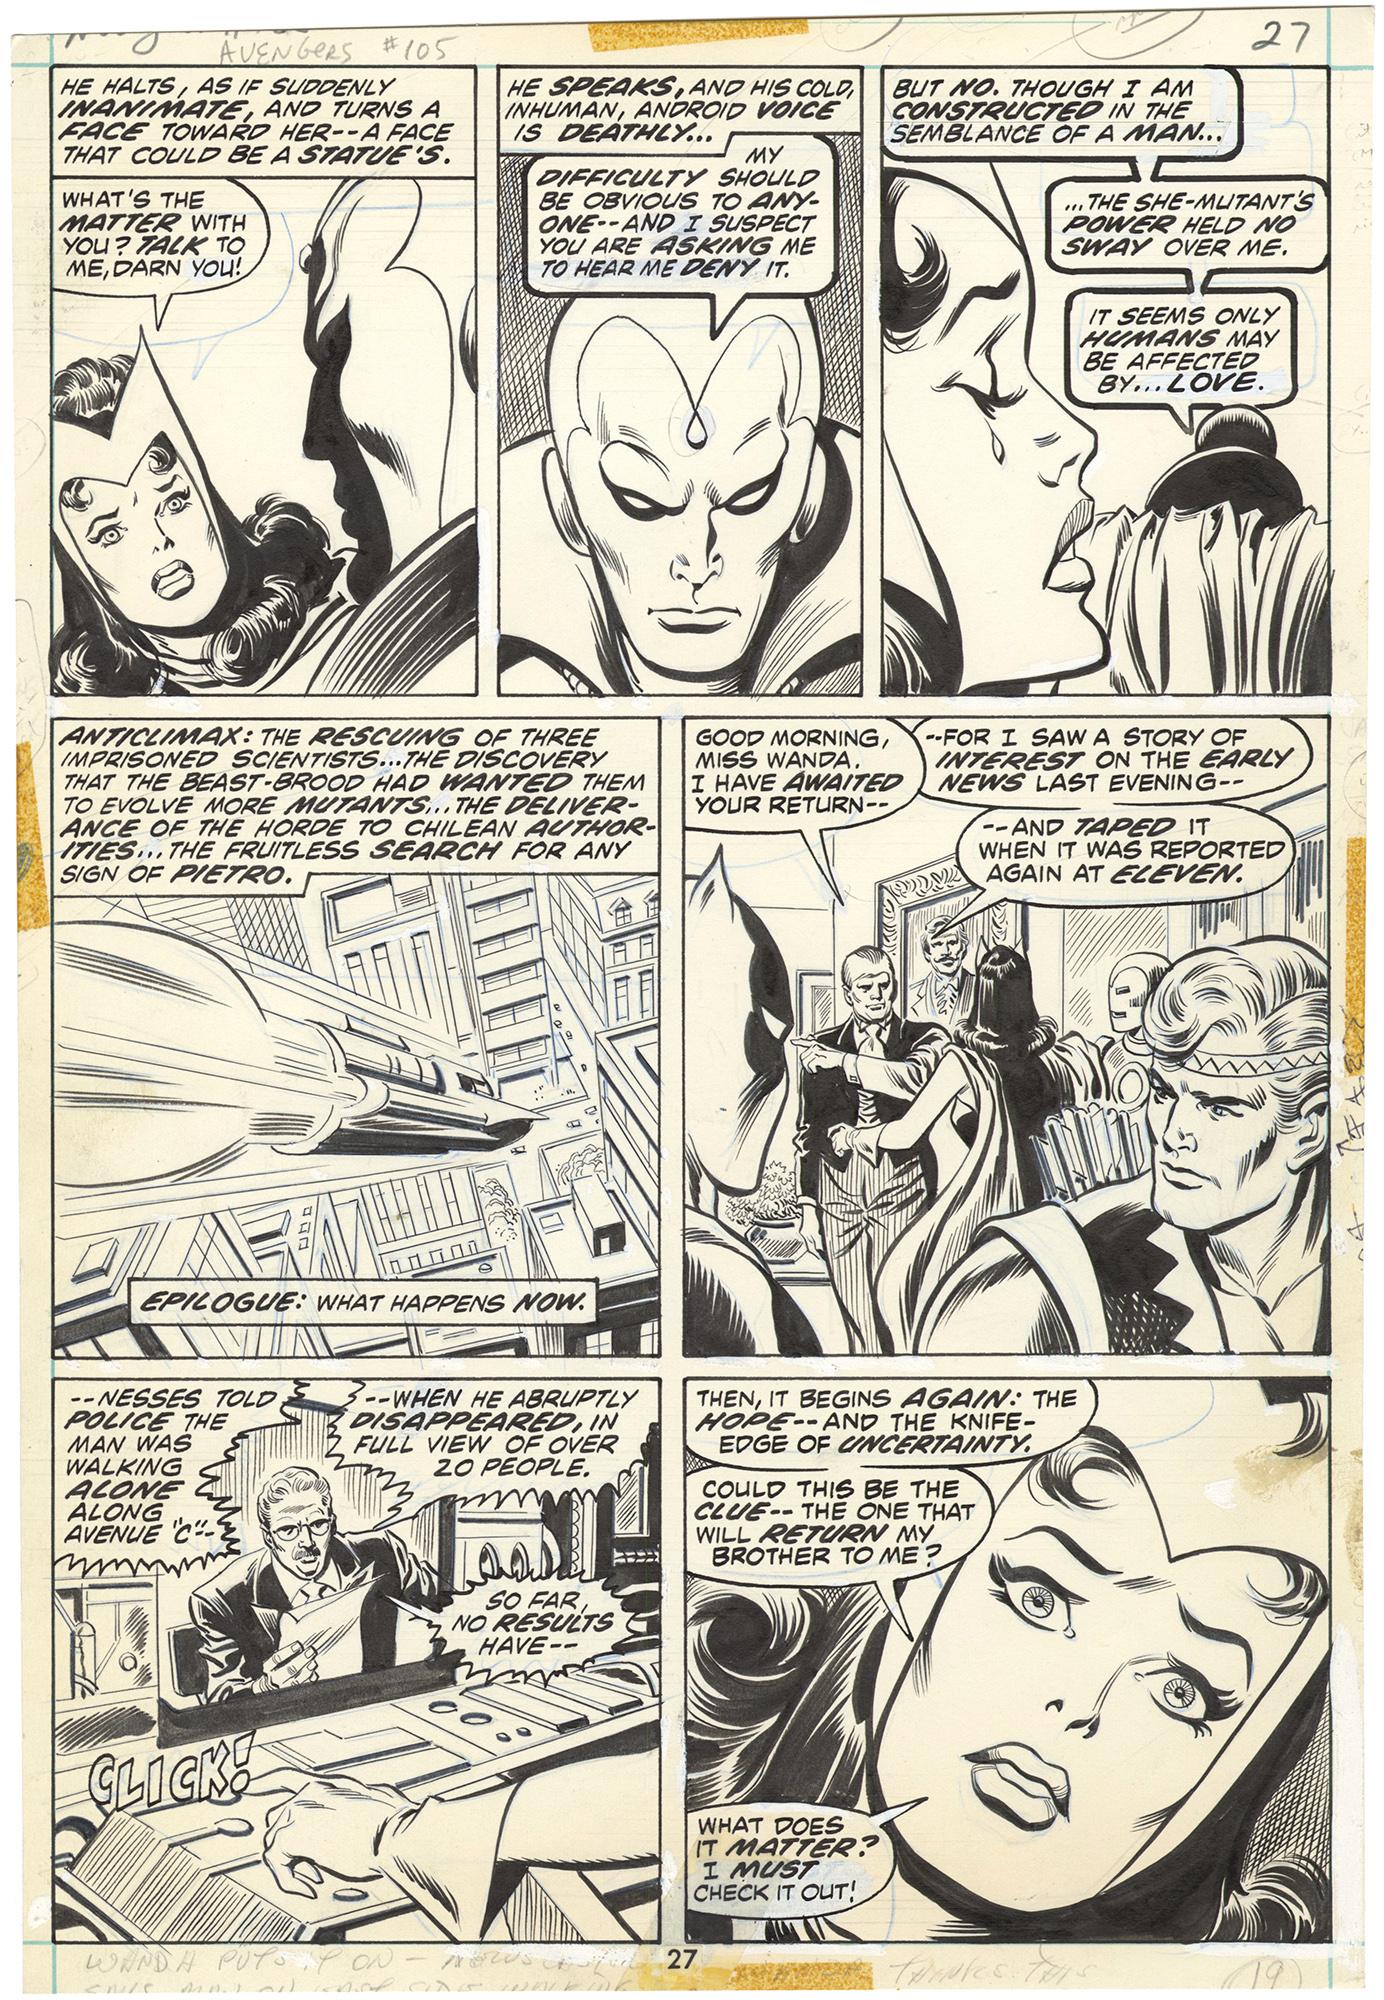 Avengers #105 p27